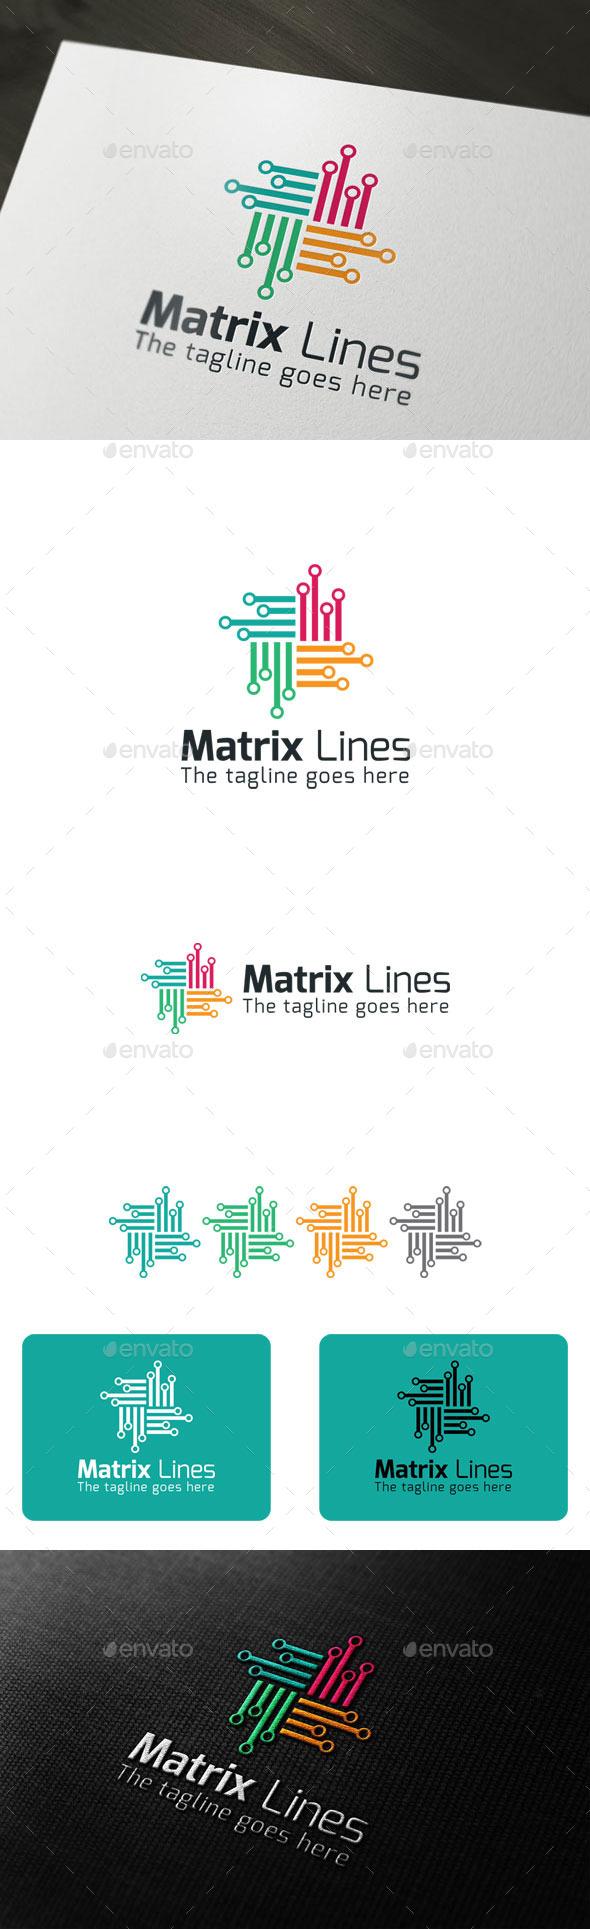 GraphicRiver Matrix Lines 9700894